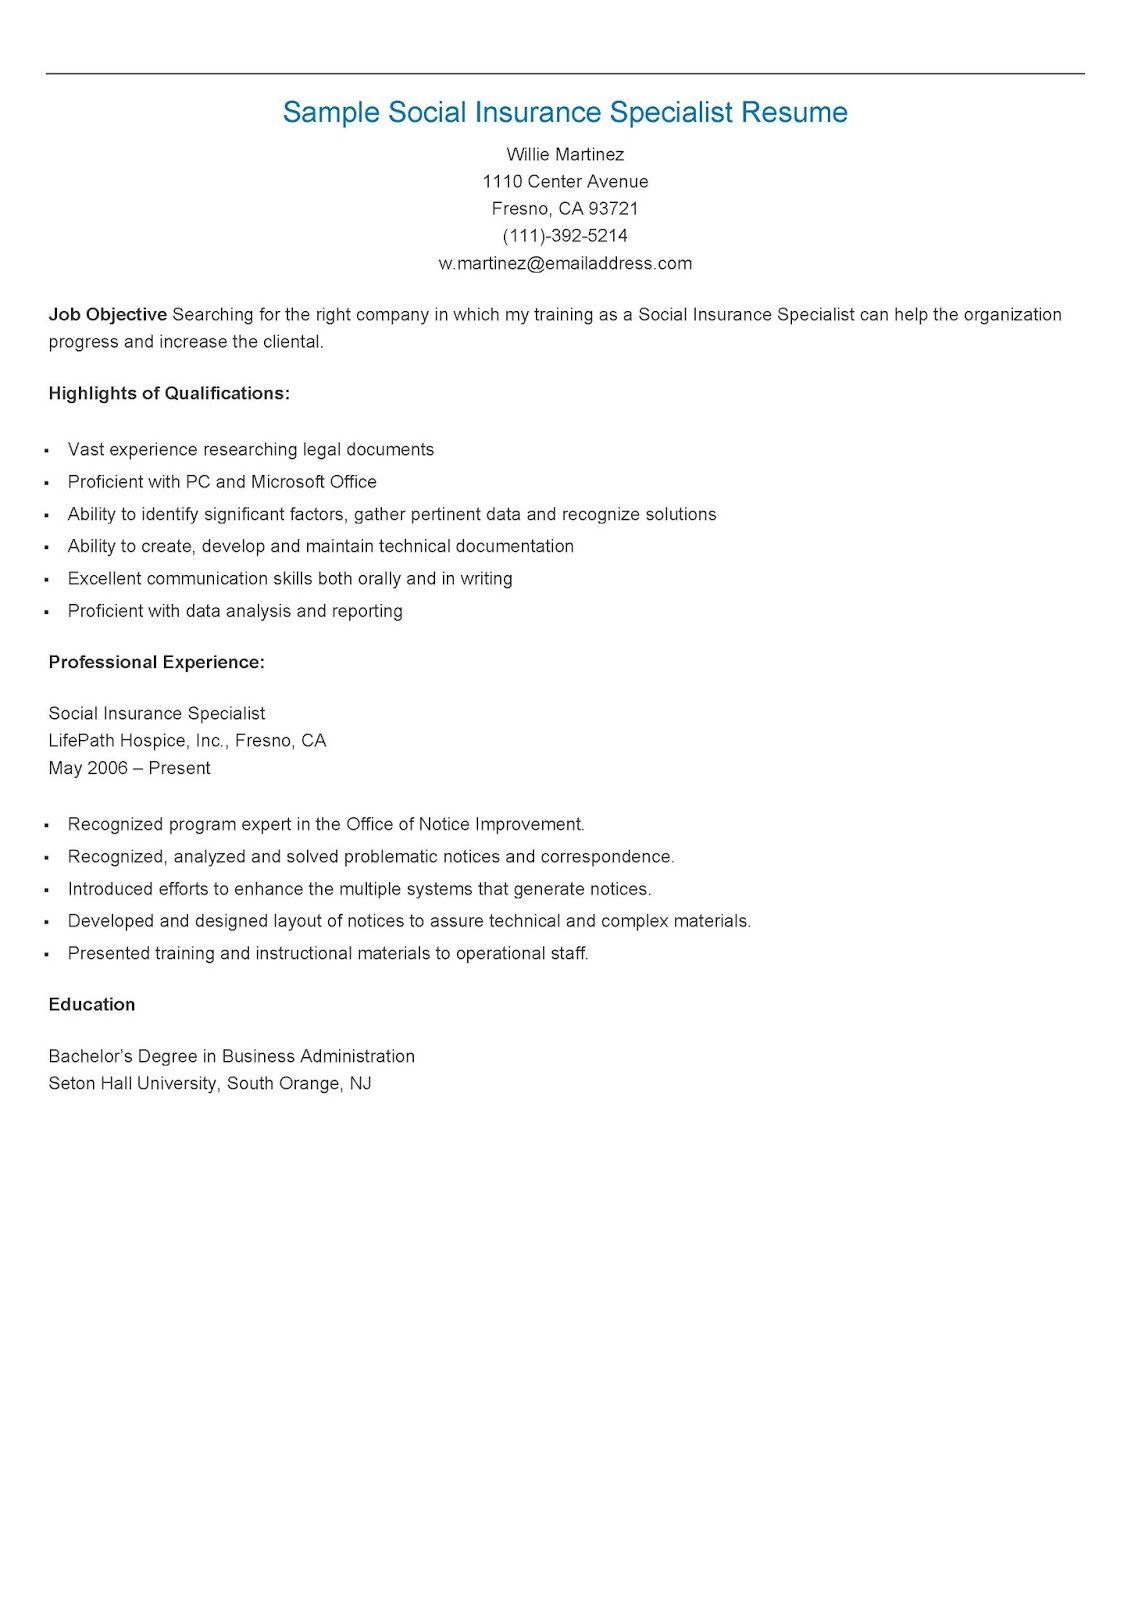 Sample Social Insurance Specialist Resume Resame Resume